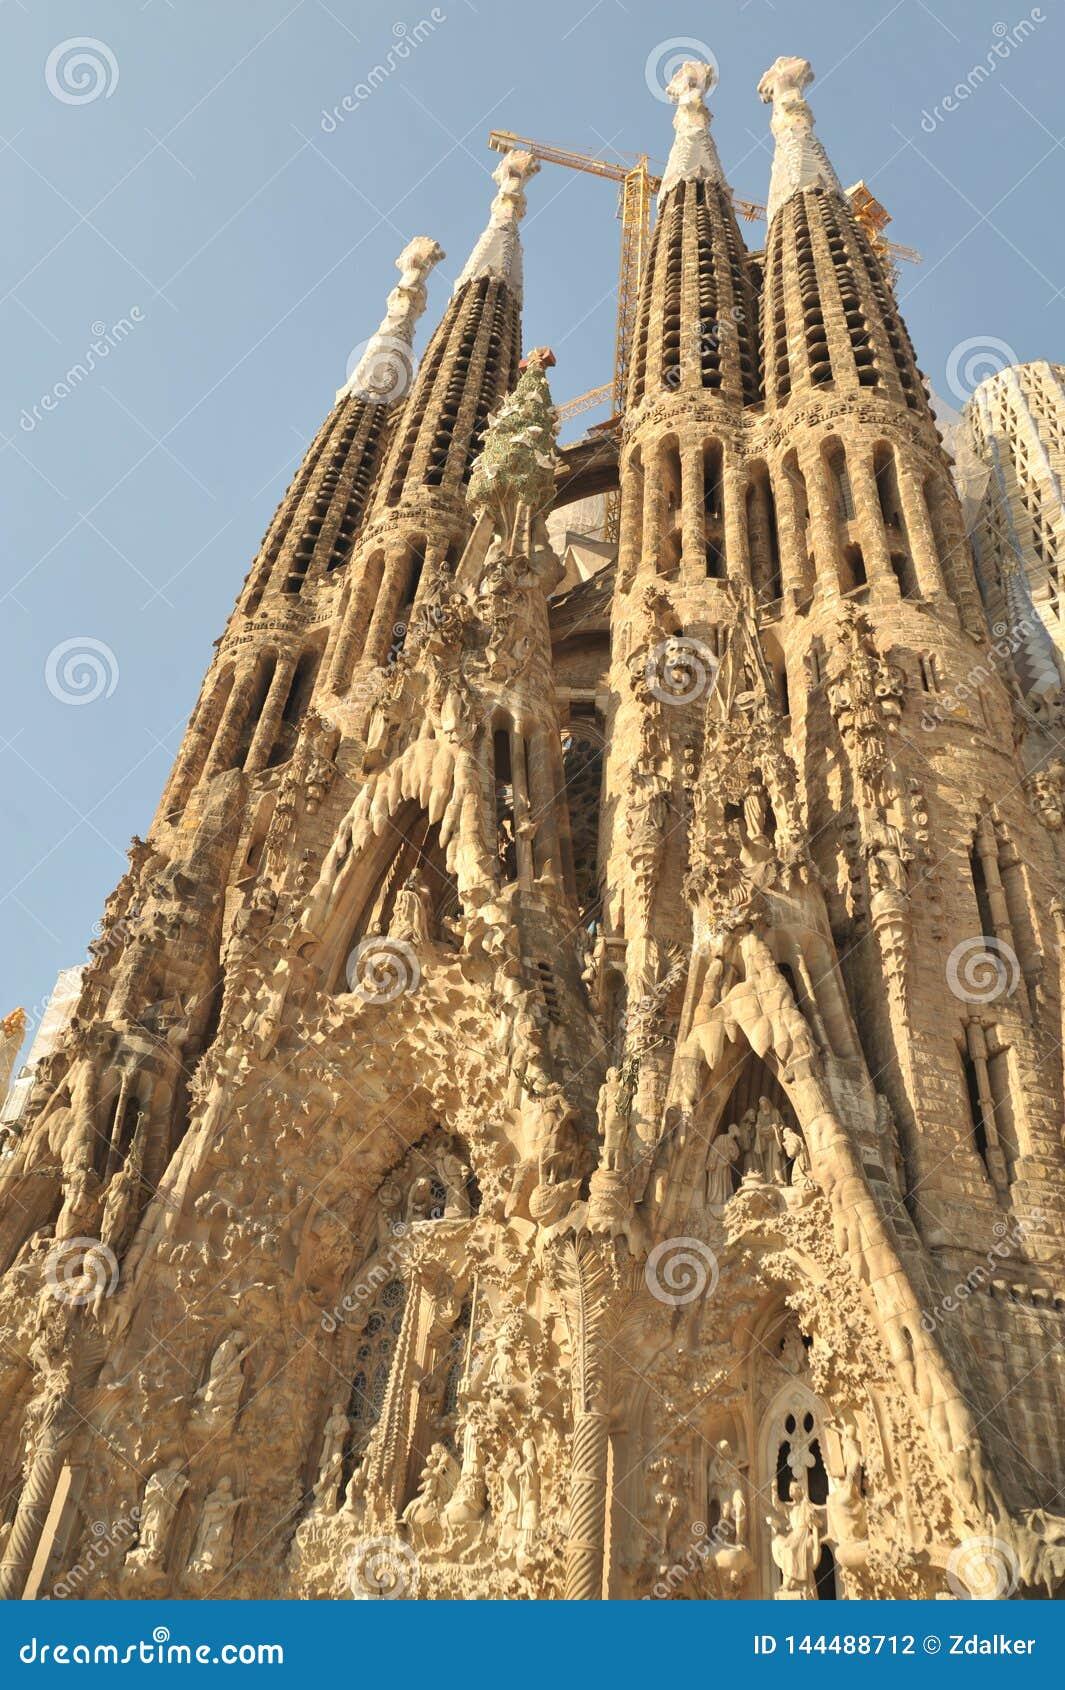 Barcelona, Spain - July 20, 2018 La Sagrada Familia, iconic landmark cathedral designed by Antoni Gaudi, build since 1882, bell t